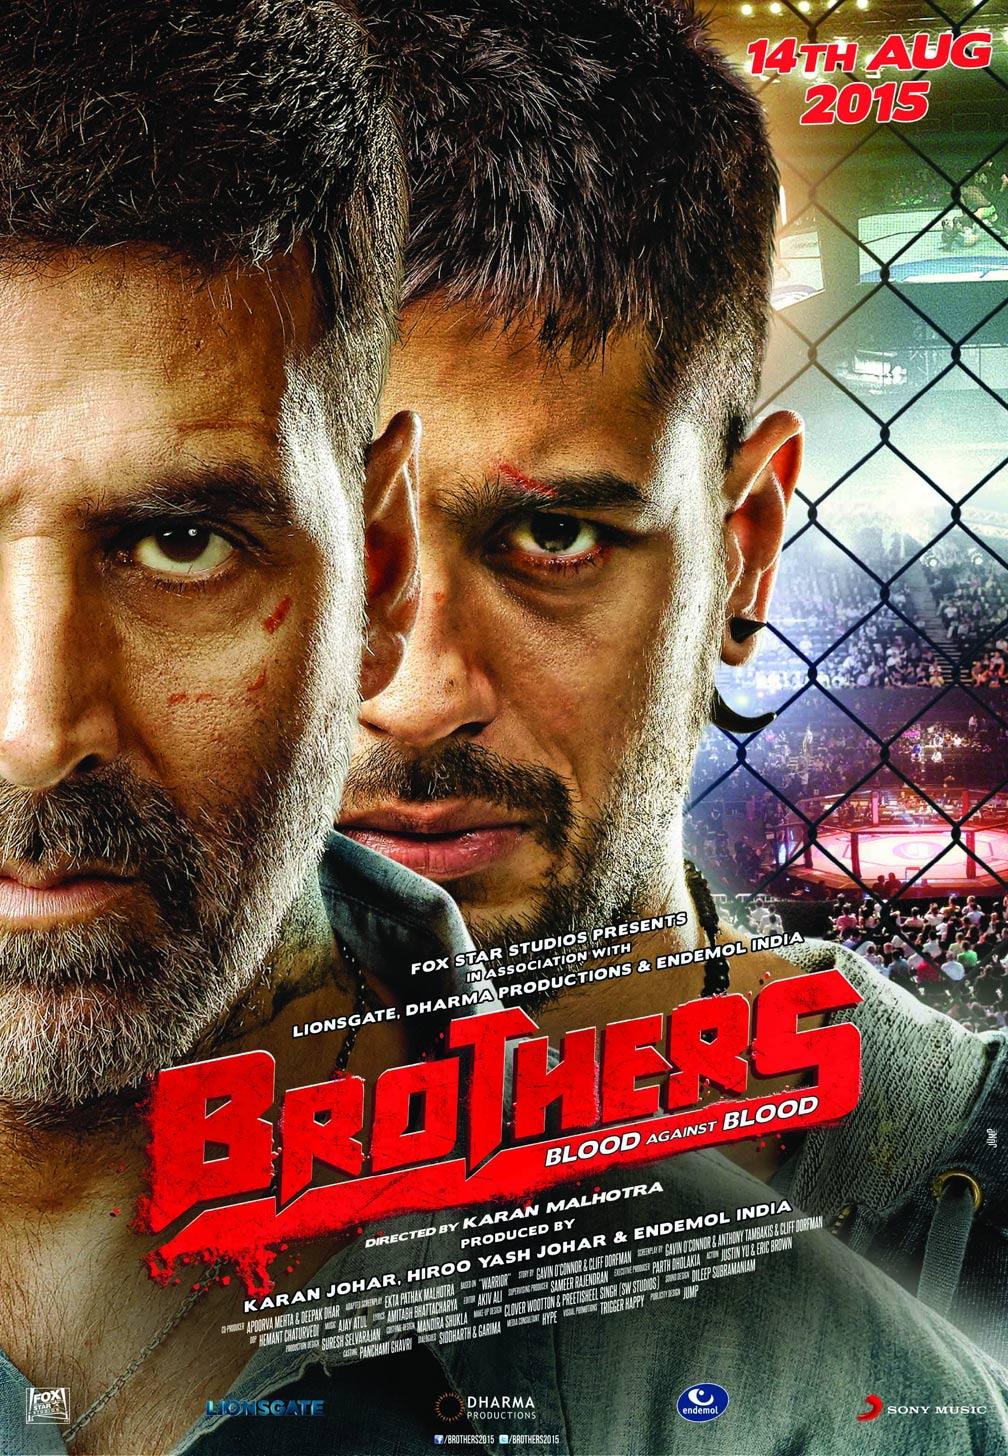 Brothers Movie Poster Ft. Akshay Kumar And Sidharth Malhotra - Full HD Desktop Wallpaper